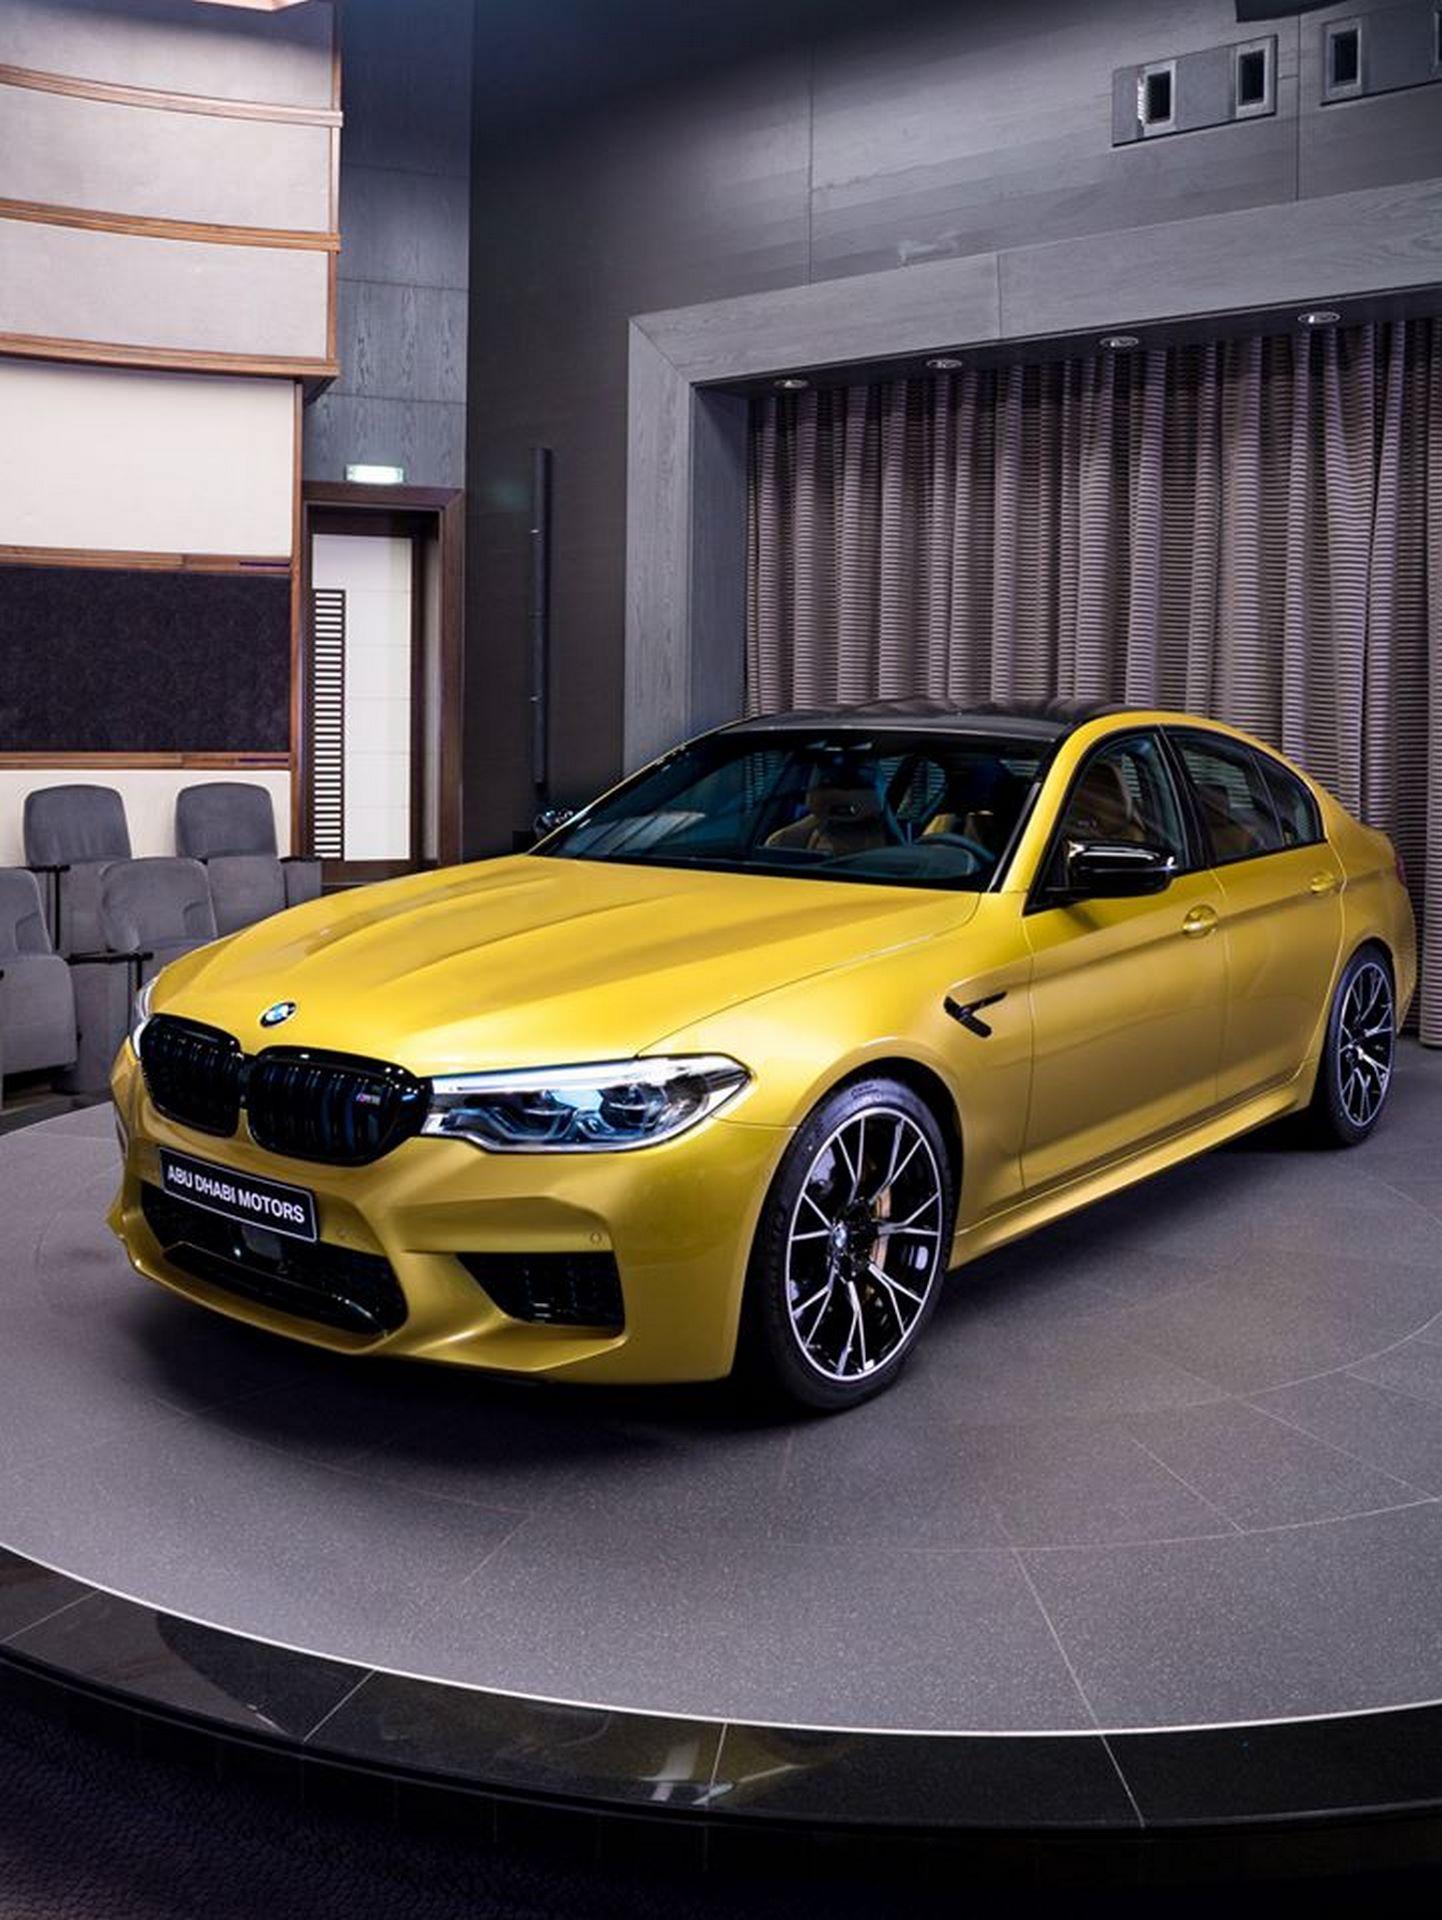 BMW-M5-Competition-Austin-Yellow-Abu-Dhabi-Motors-3